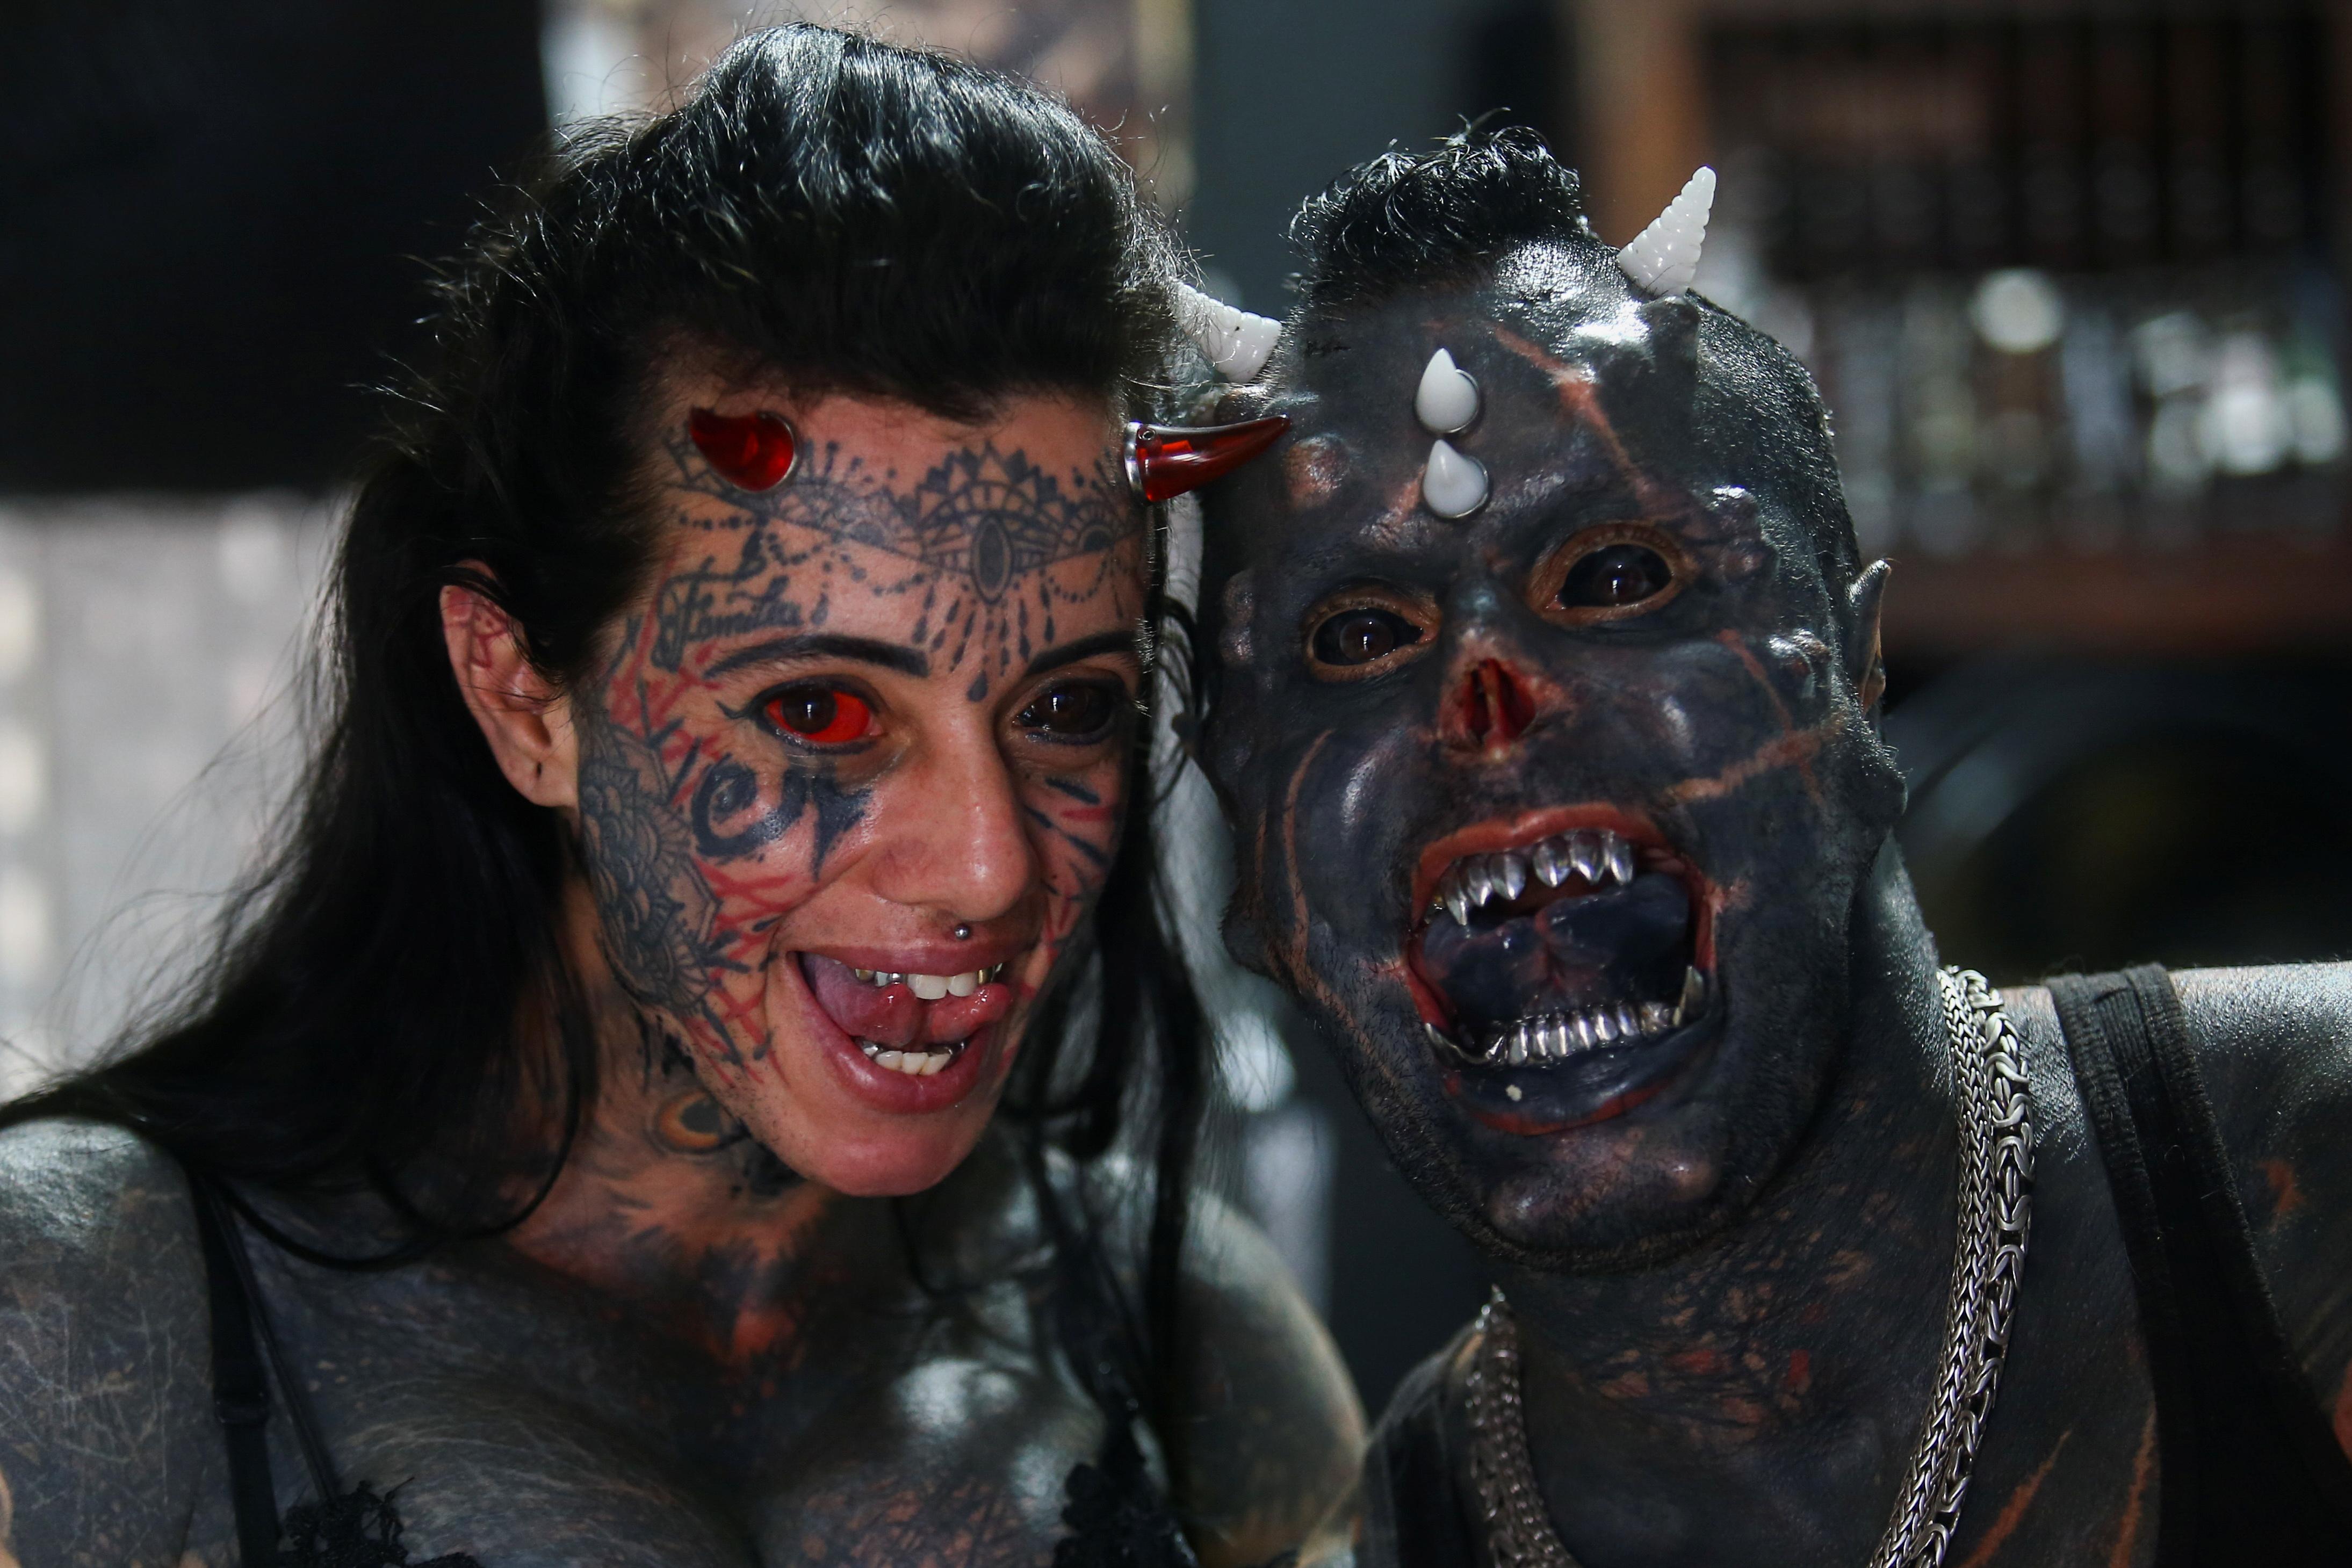 Brazilian tattoo artist Michel Praddo, also known as Diabao or Human Satan, and his wife Carol Praddo, known as Mulher Demonia or Demon Woman, pose in their studio in Praia Grande, Brazil August 18, 2021. REUTERS/Carla Carniel